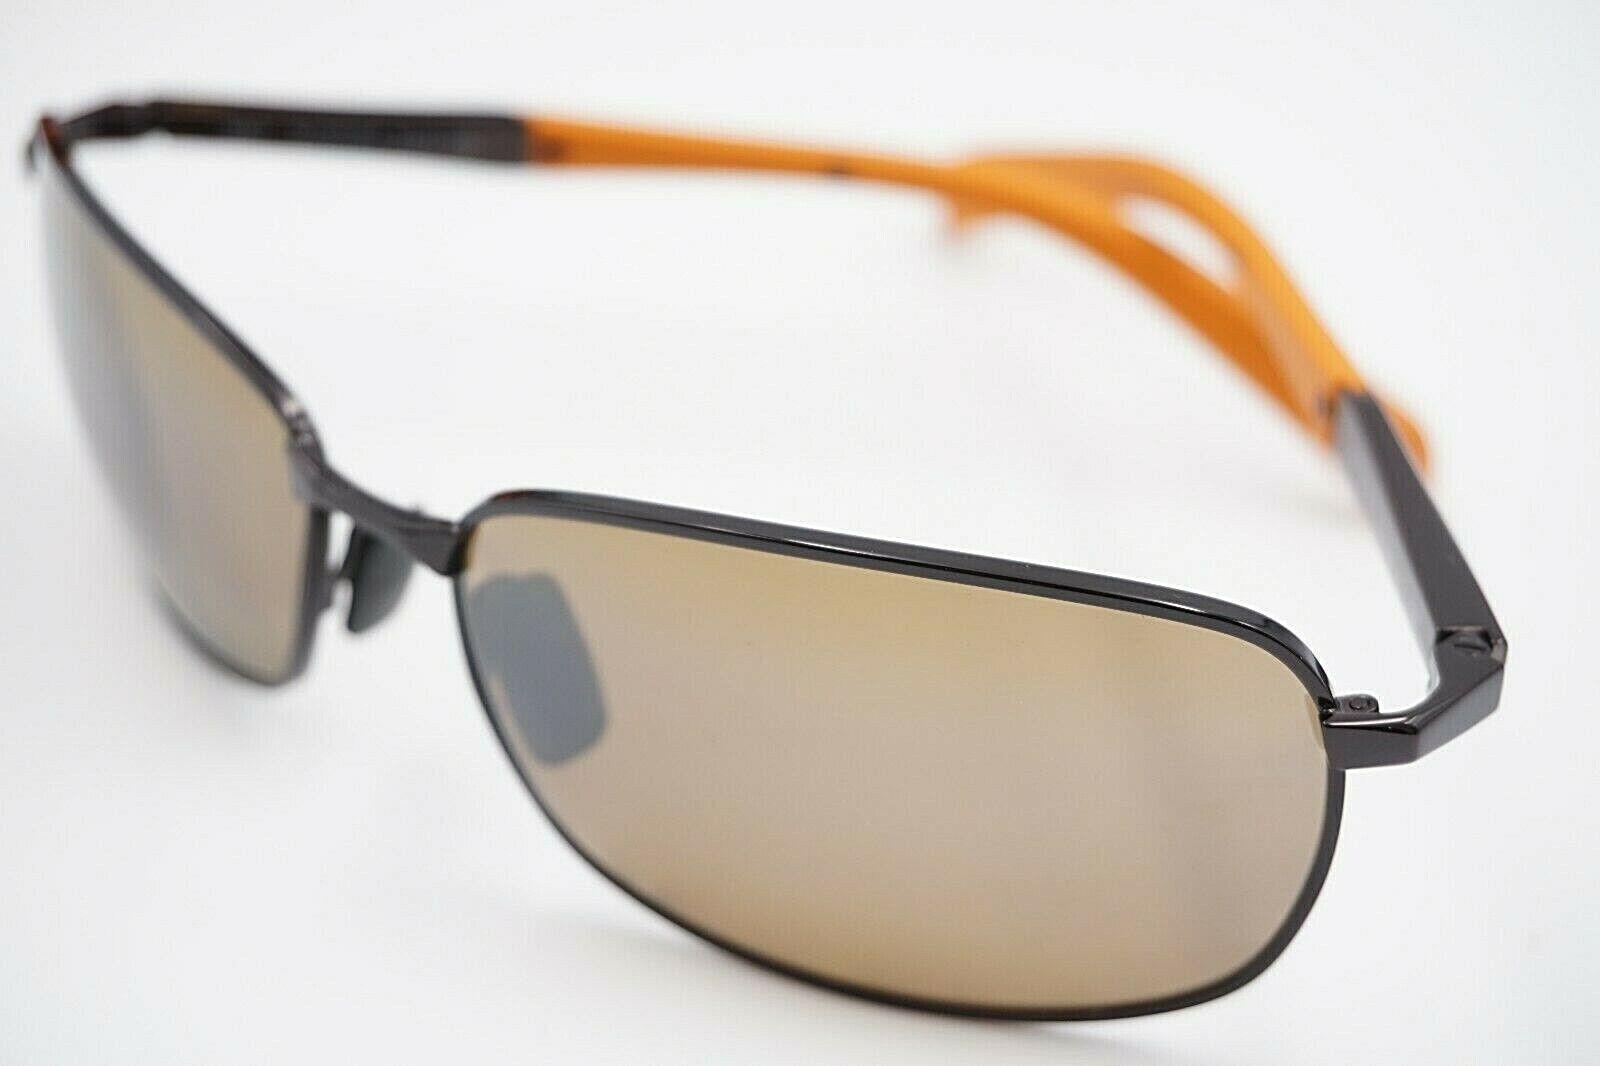 864132d578 Maui Jim Sunglasses Long Beach Expresso W HCL Bronze Polarized 299 ...